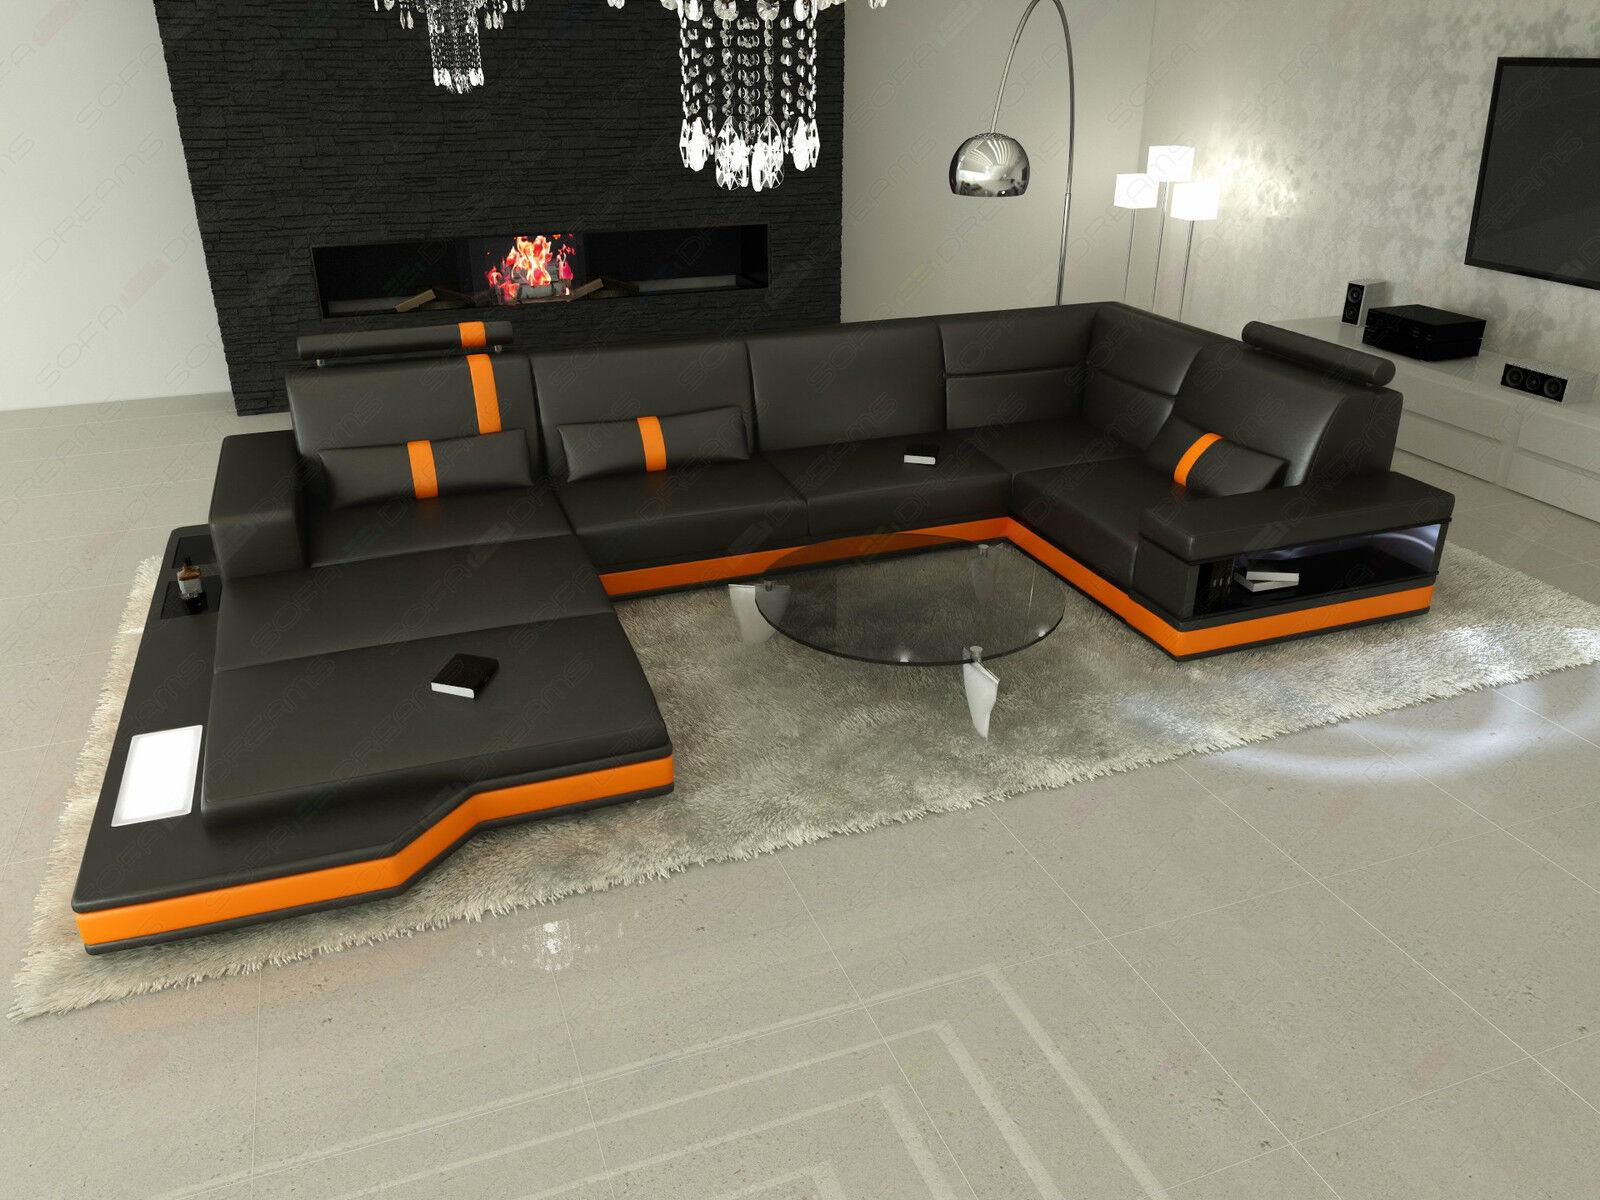 Ledersofa messana designer sofa wohnlandschaft licht eur for Ledersofa wohnlandschaft